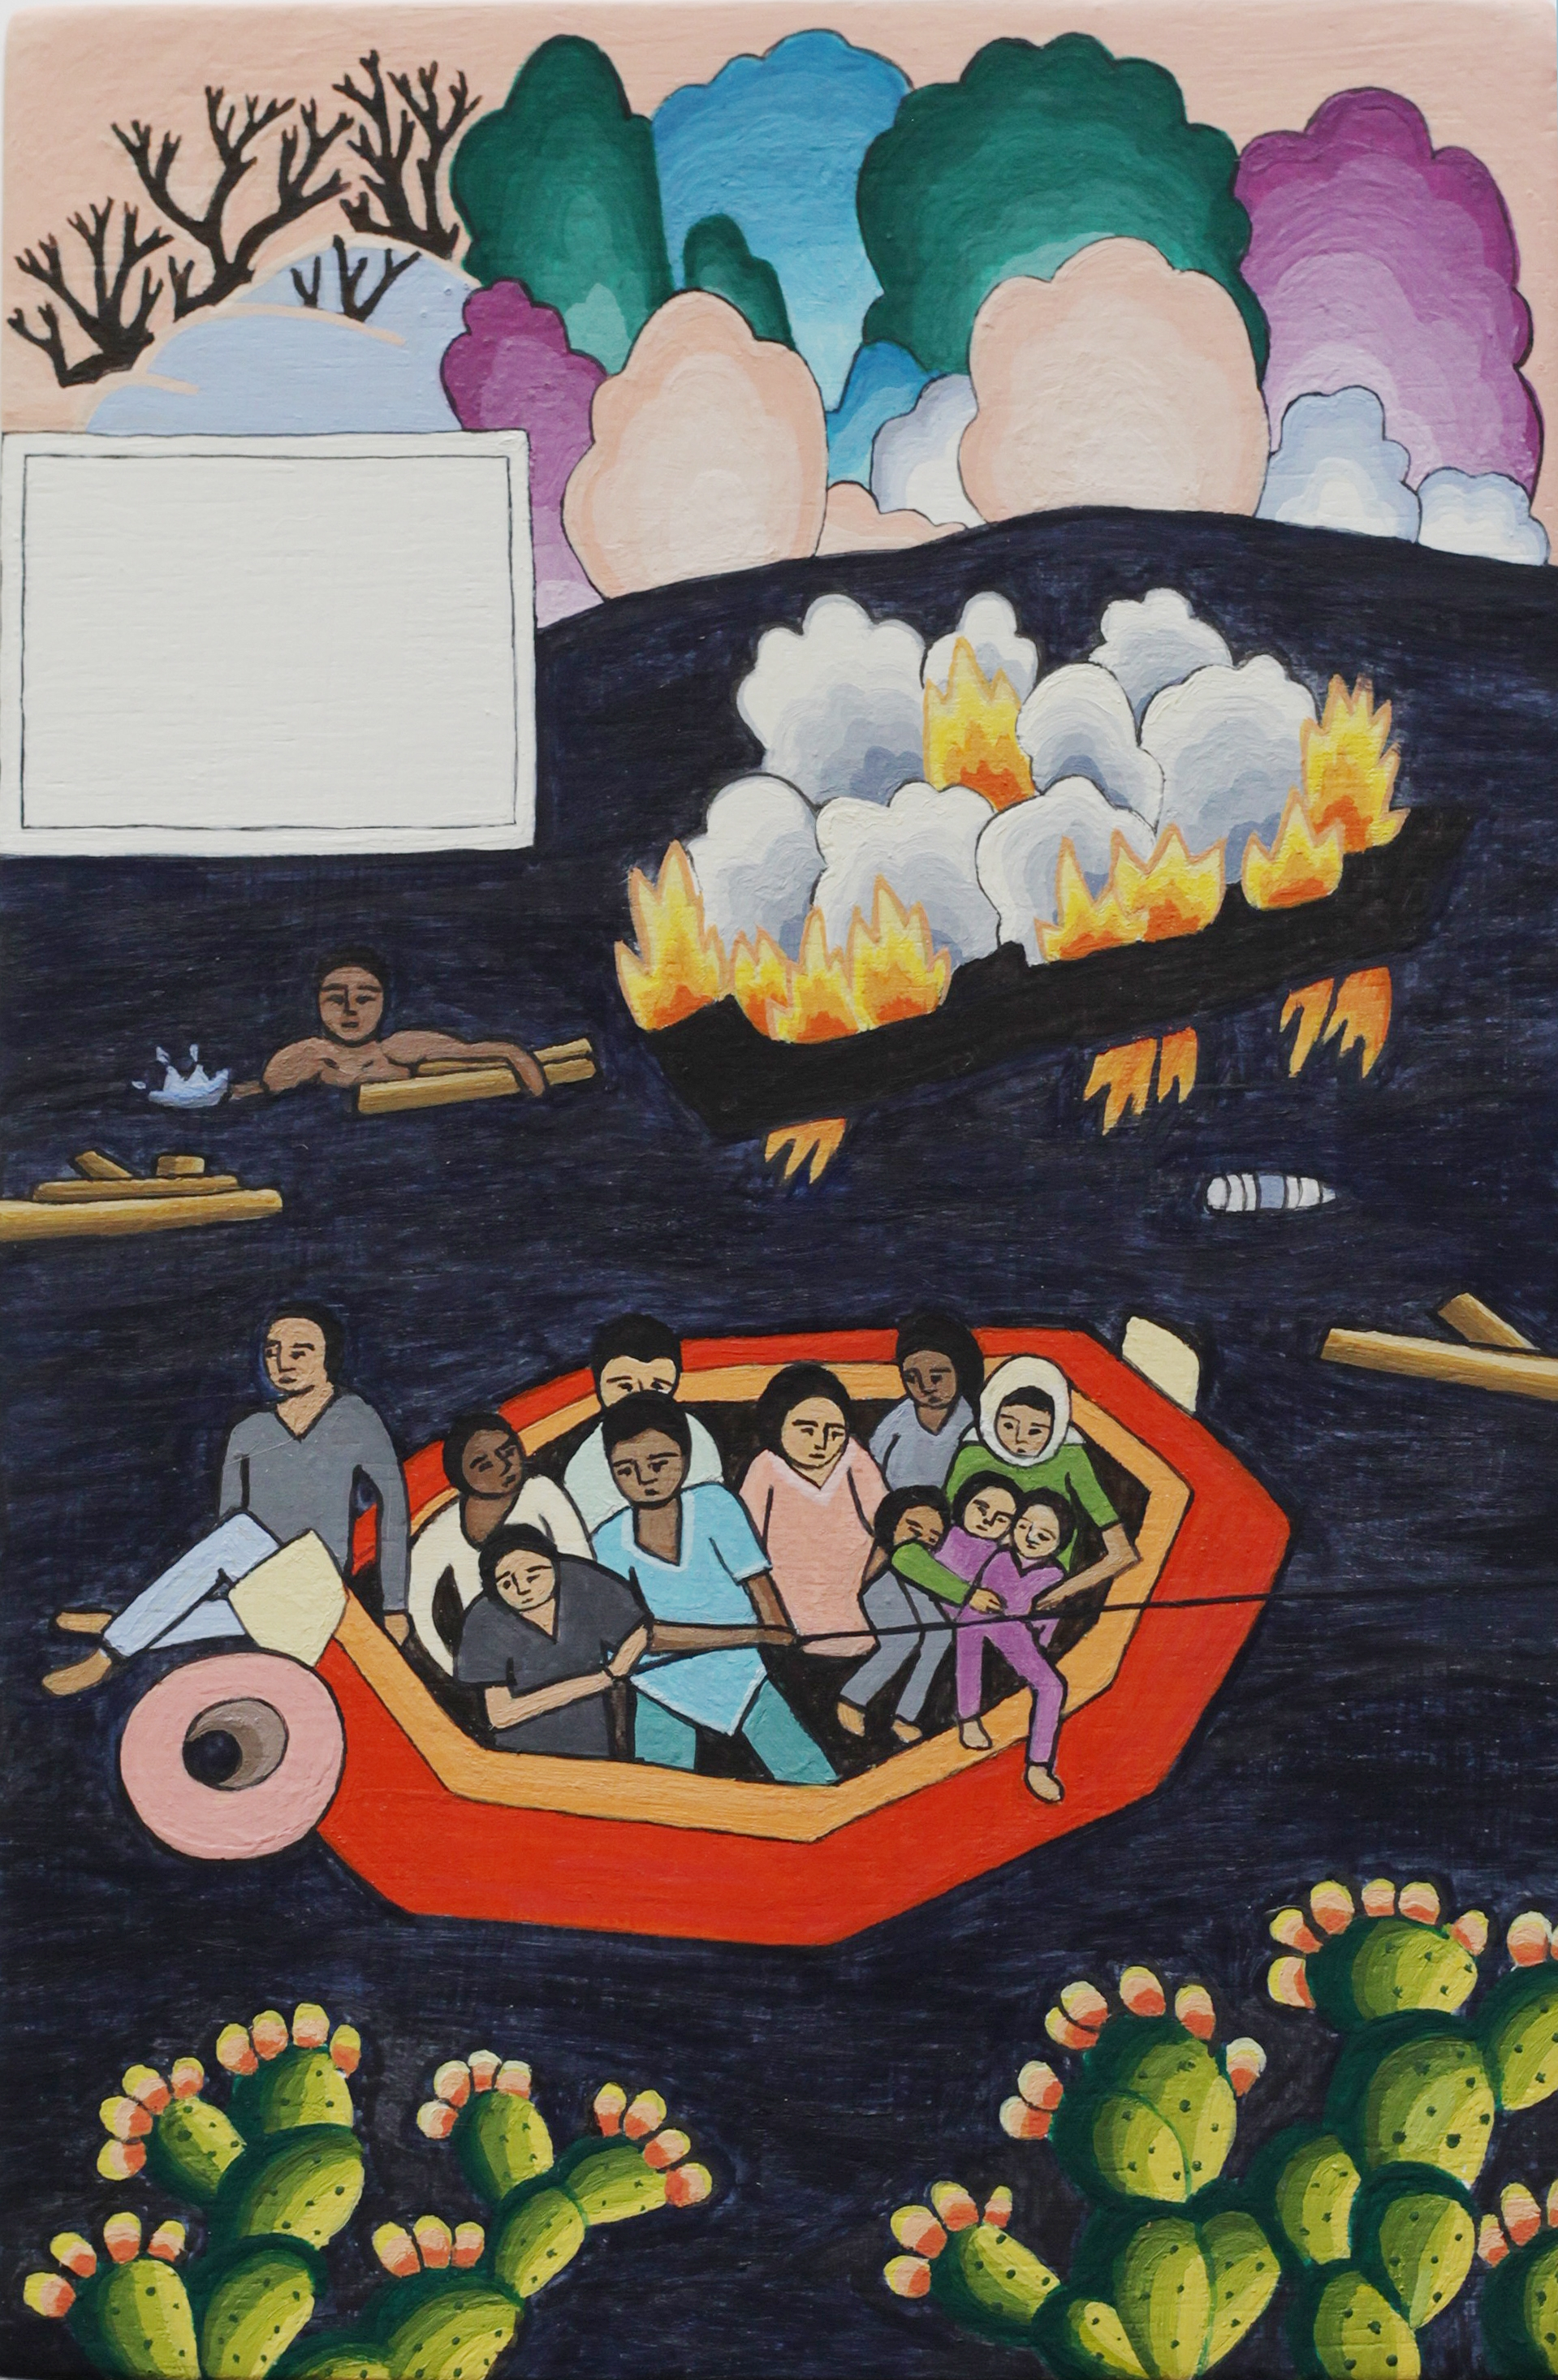 Migrant Shipwreck off Lampedusa, Mediterranean Sea